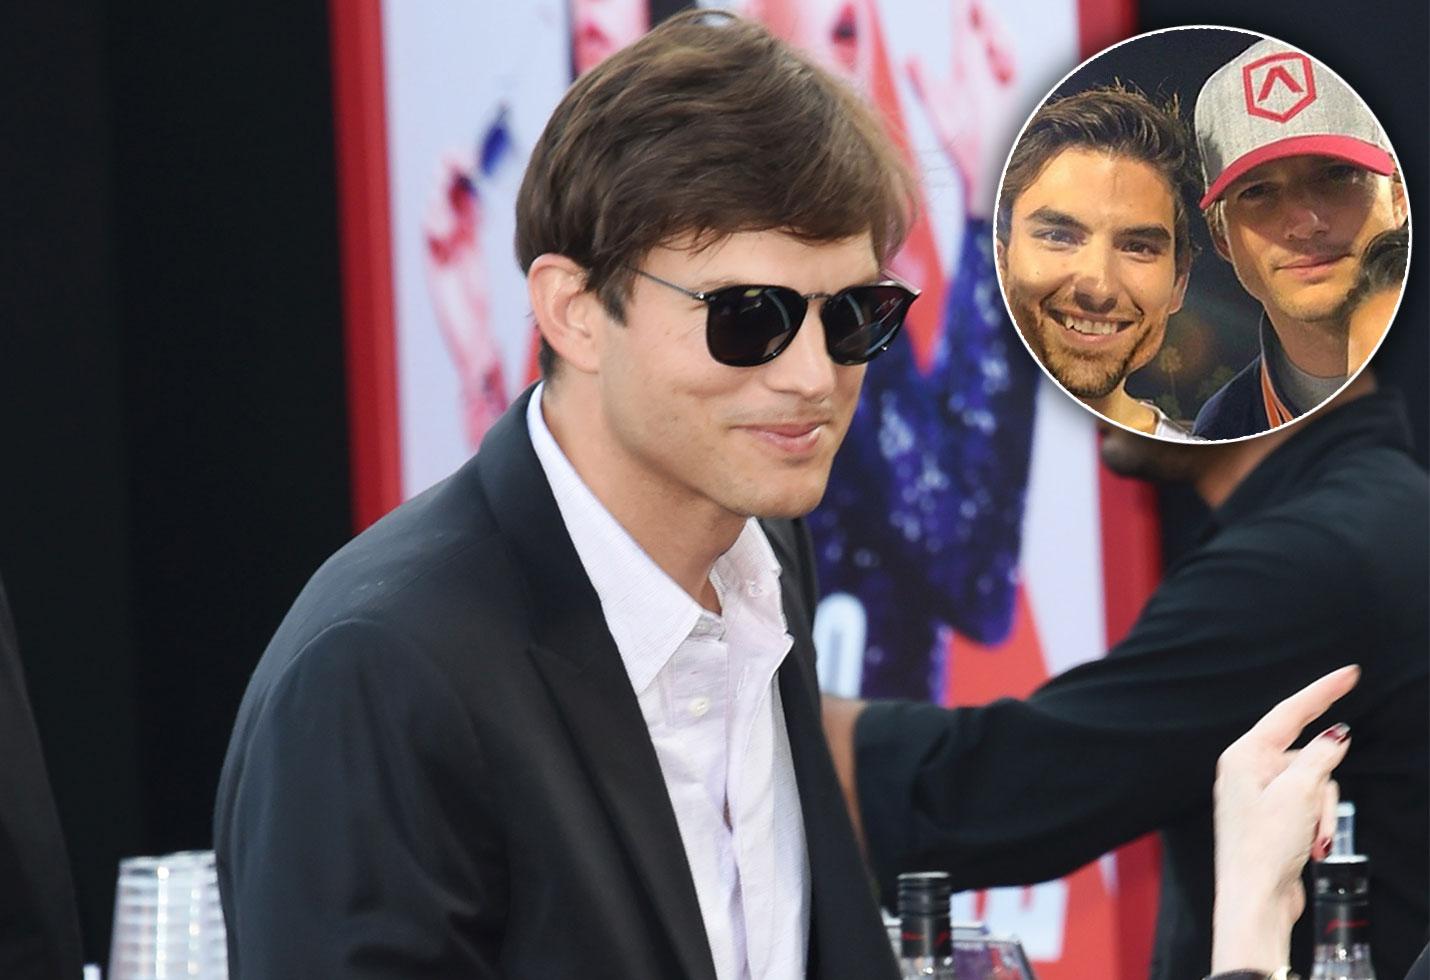 ashton kutcher jared haibon mila kunis ashley iaconetti